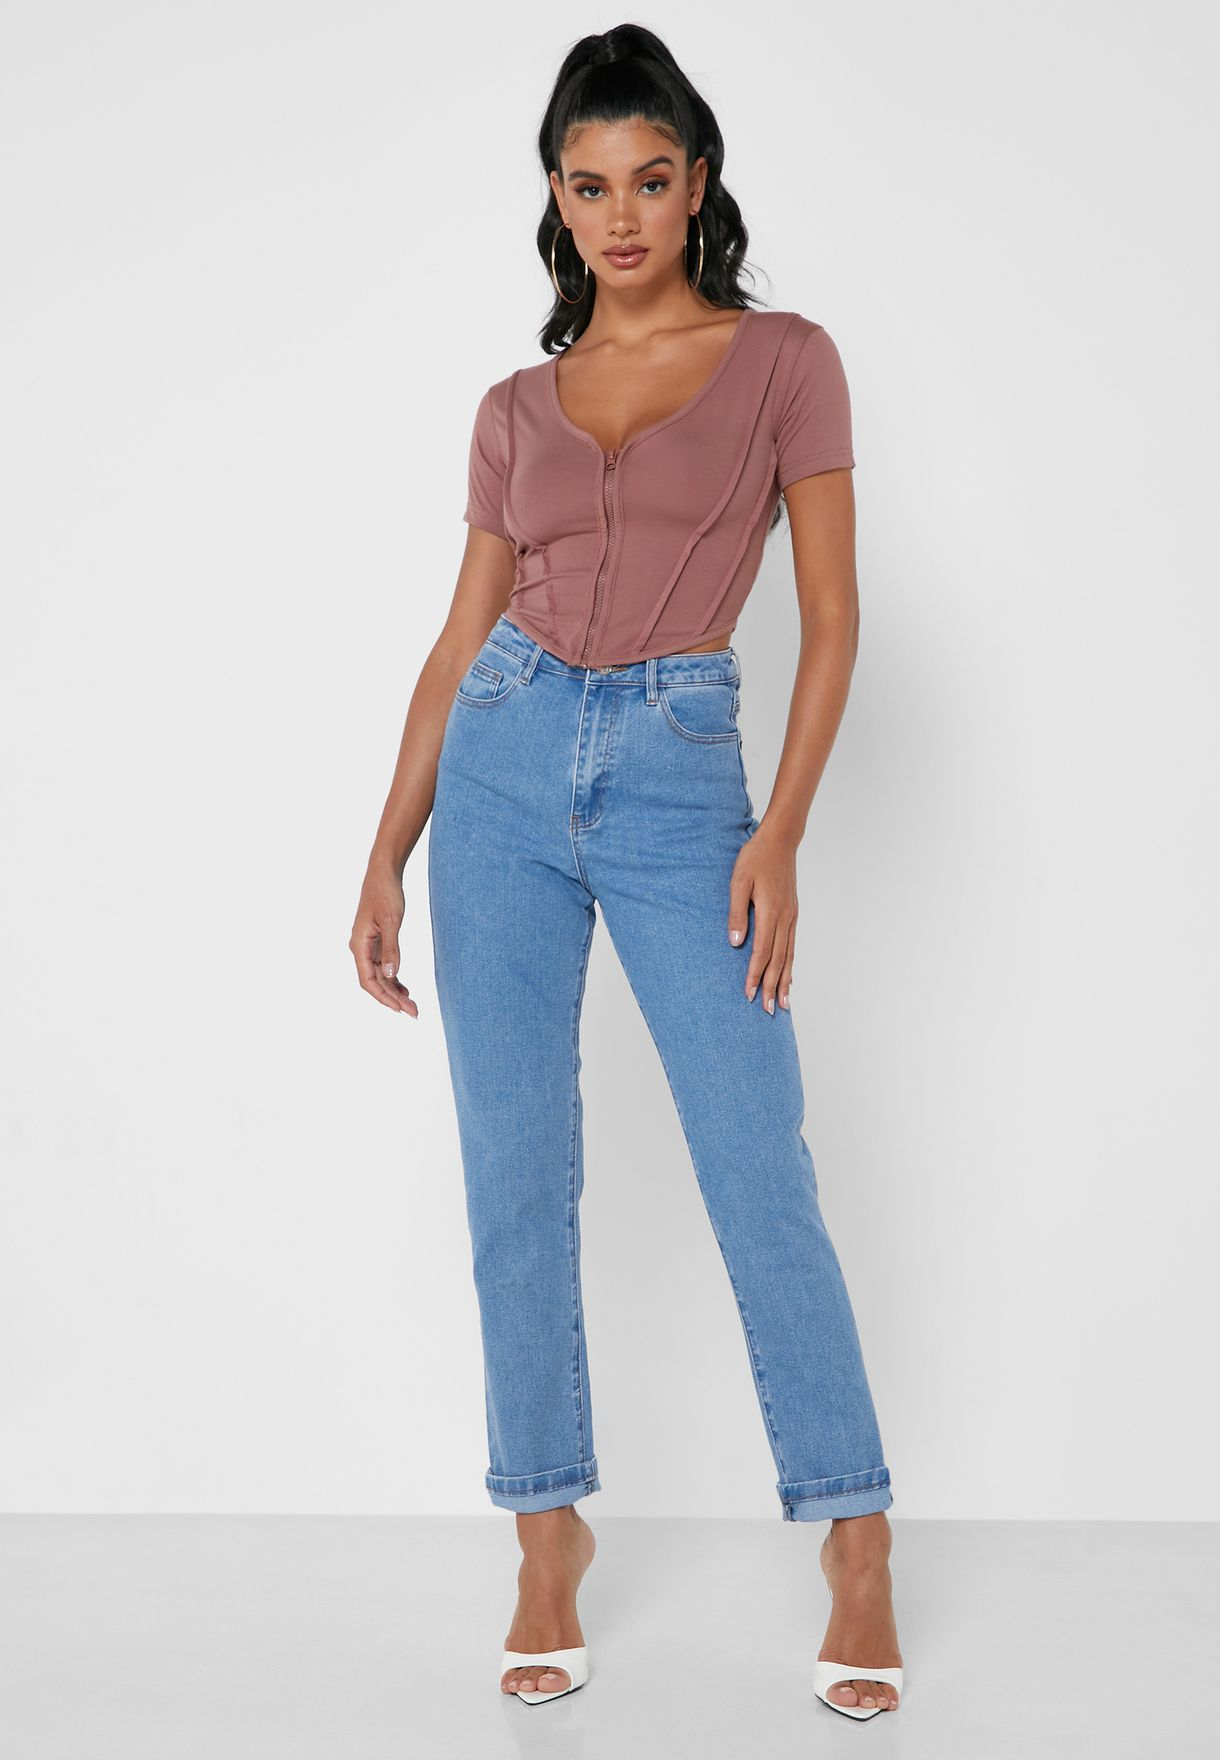 High Waist Mid Wash Jeans